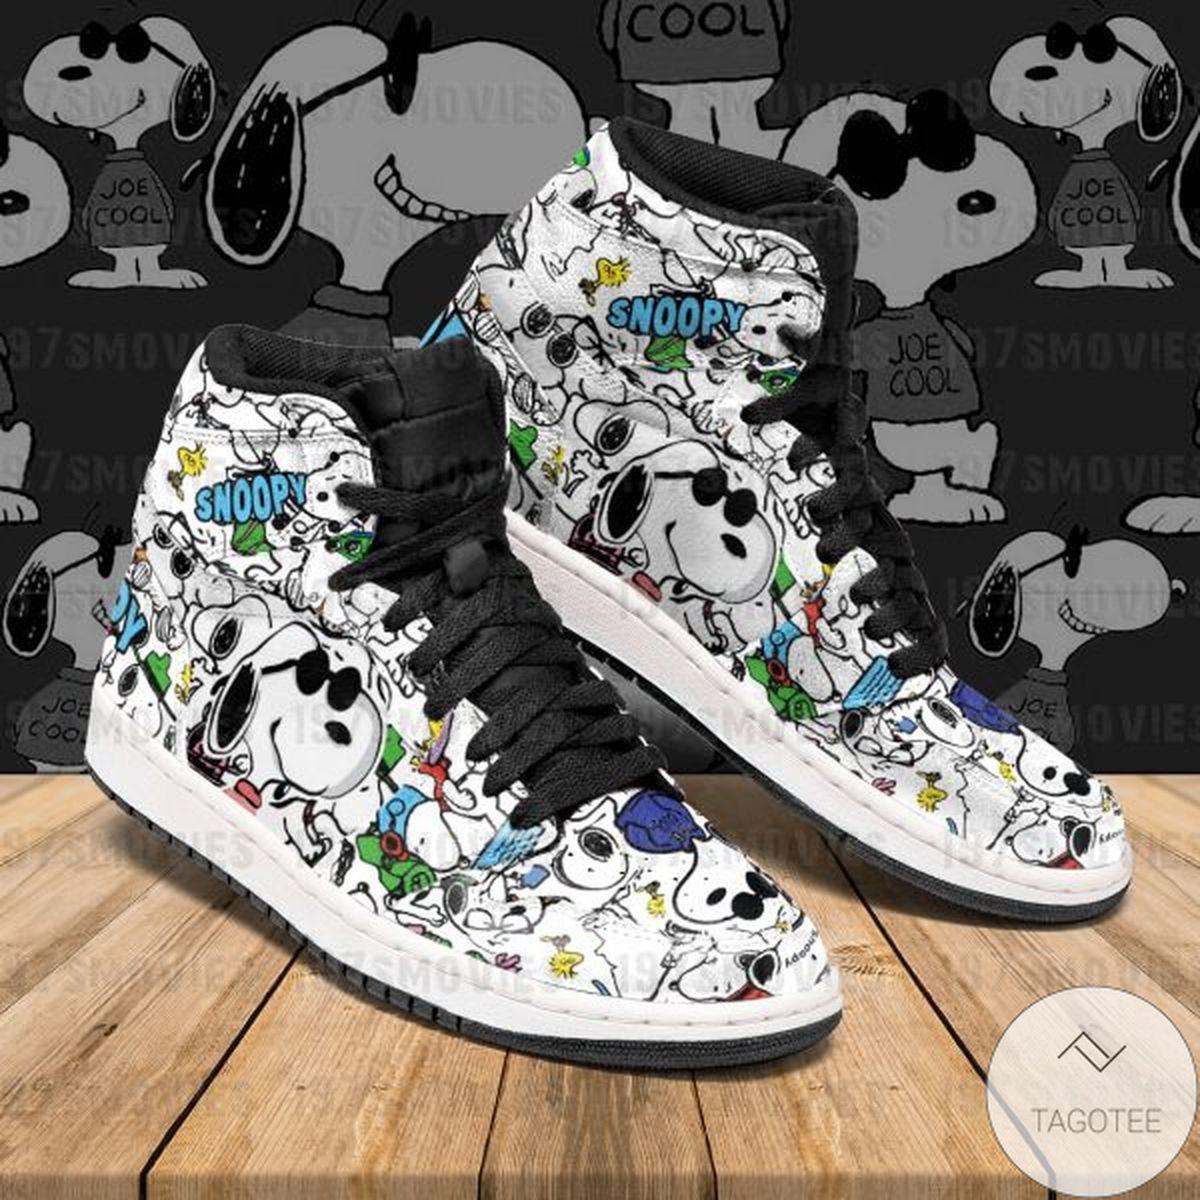 Snoopy Sneaker Air Jordan High Top Shoes